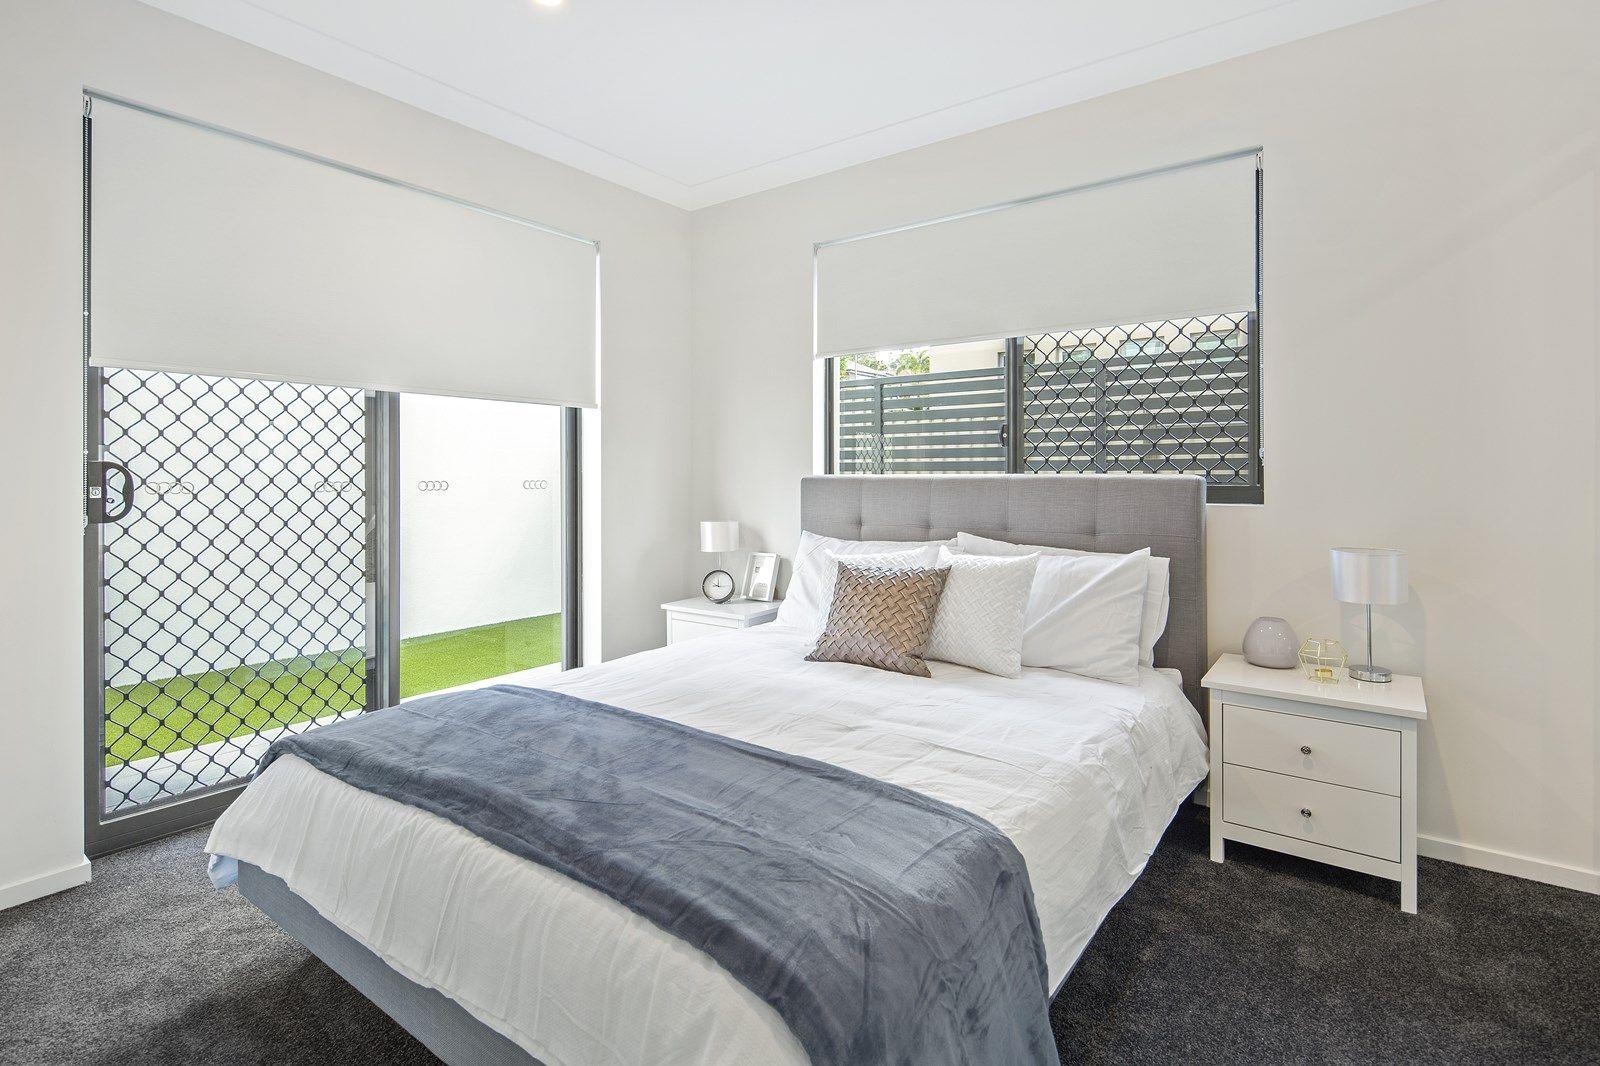 17/74 Gosford Street, Mount Gravatt QLD 4122, Image 2